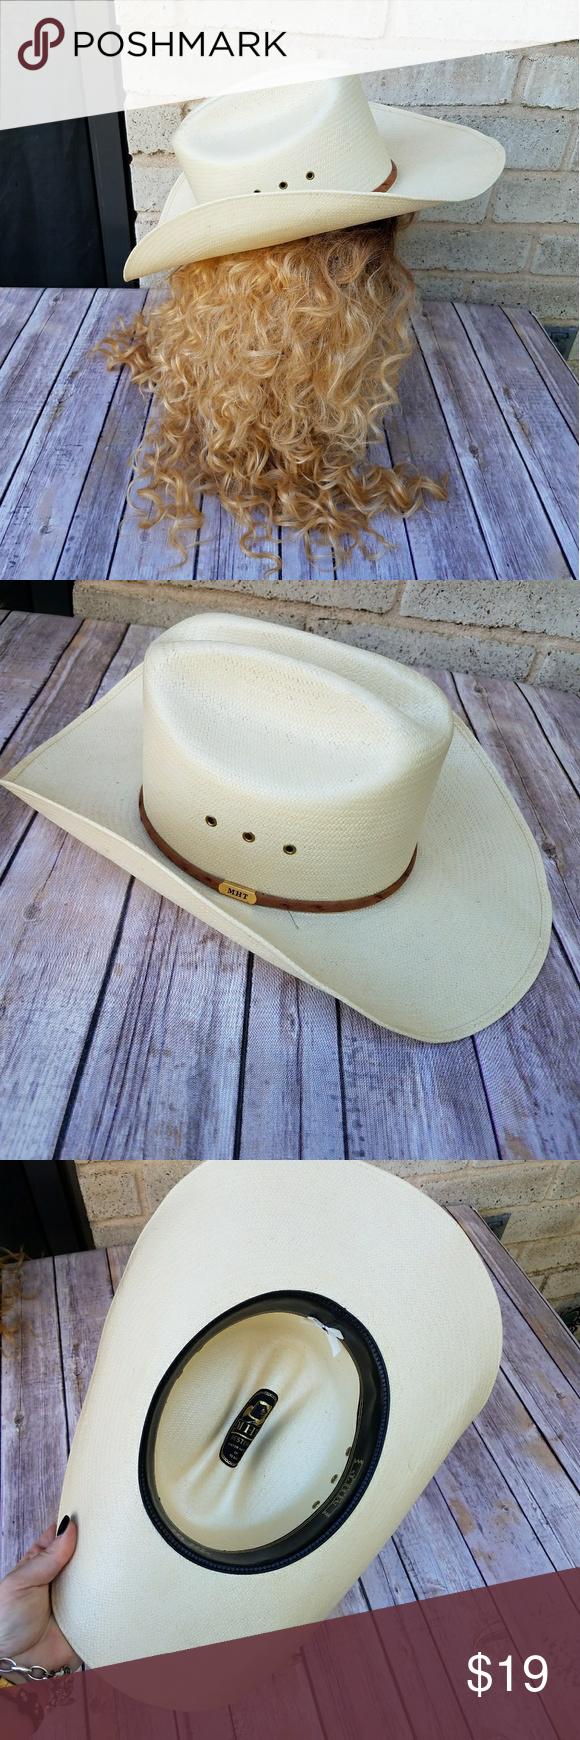 9e7f0b45b1ad3 MHT Texas Ranger Captain Straw Cowboy Hat Master hatters of Texas brand -  Texas Rangers Captain